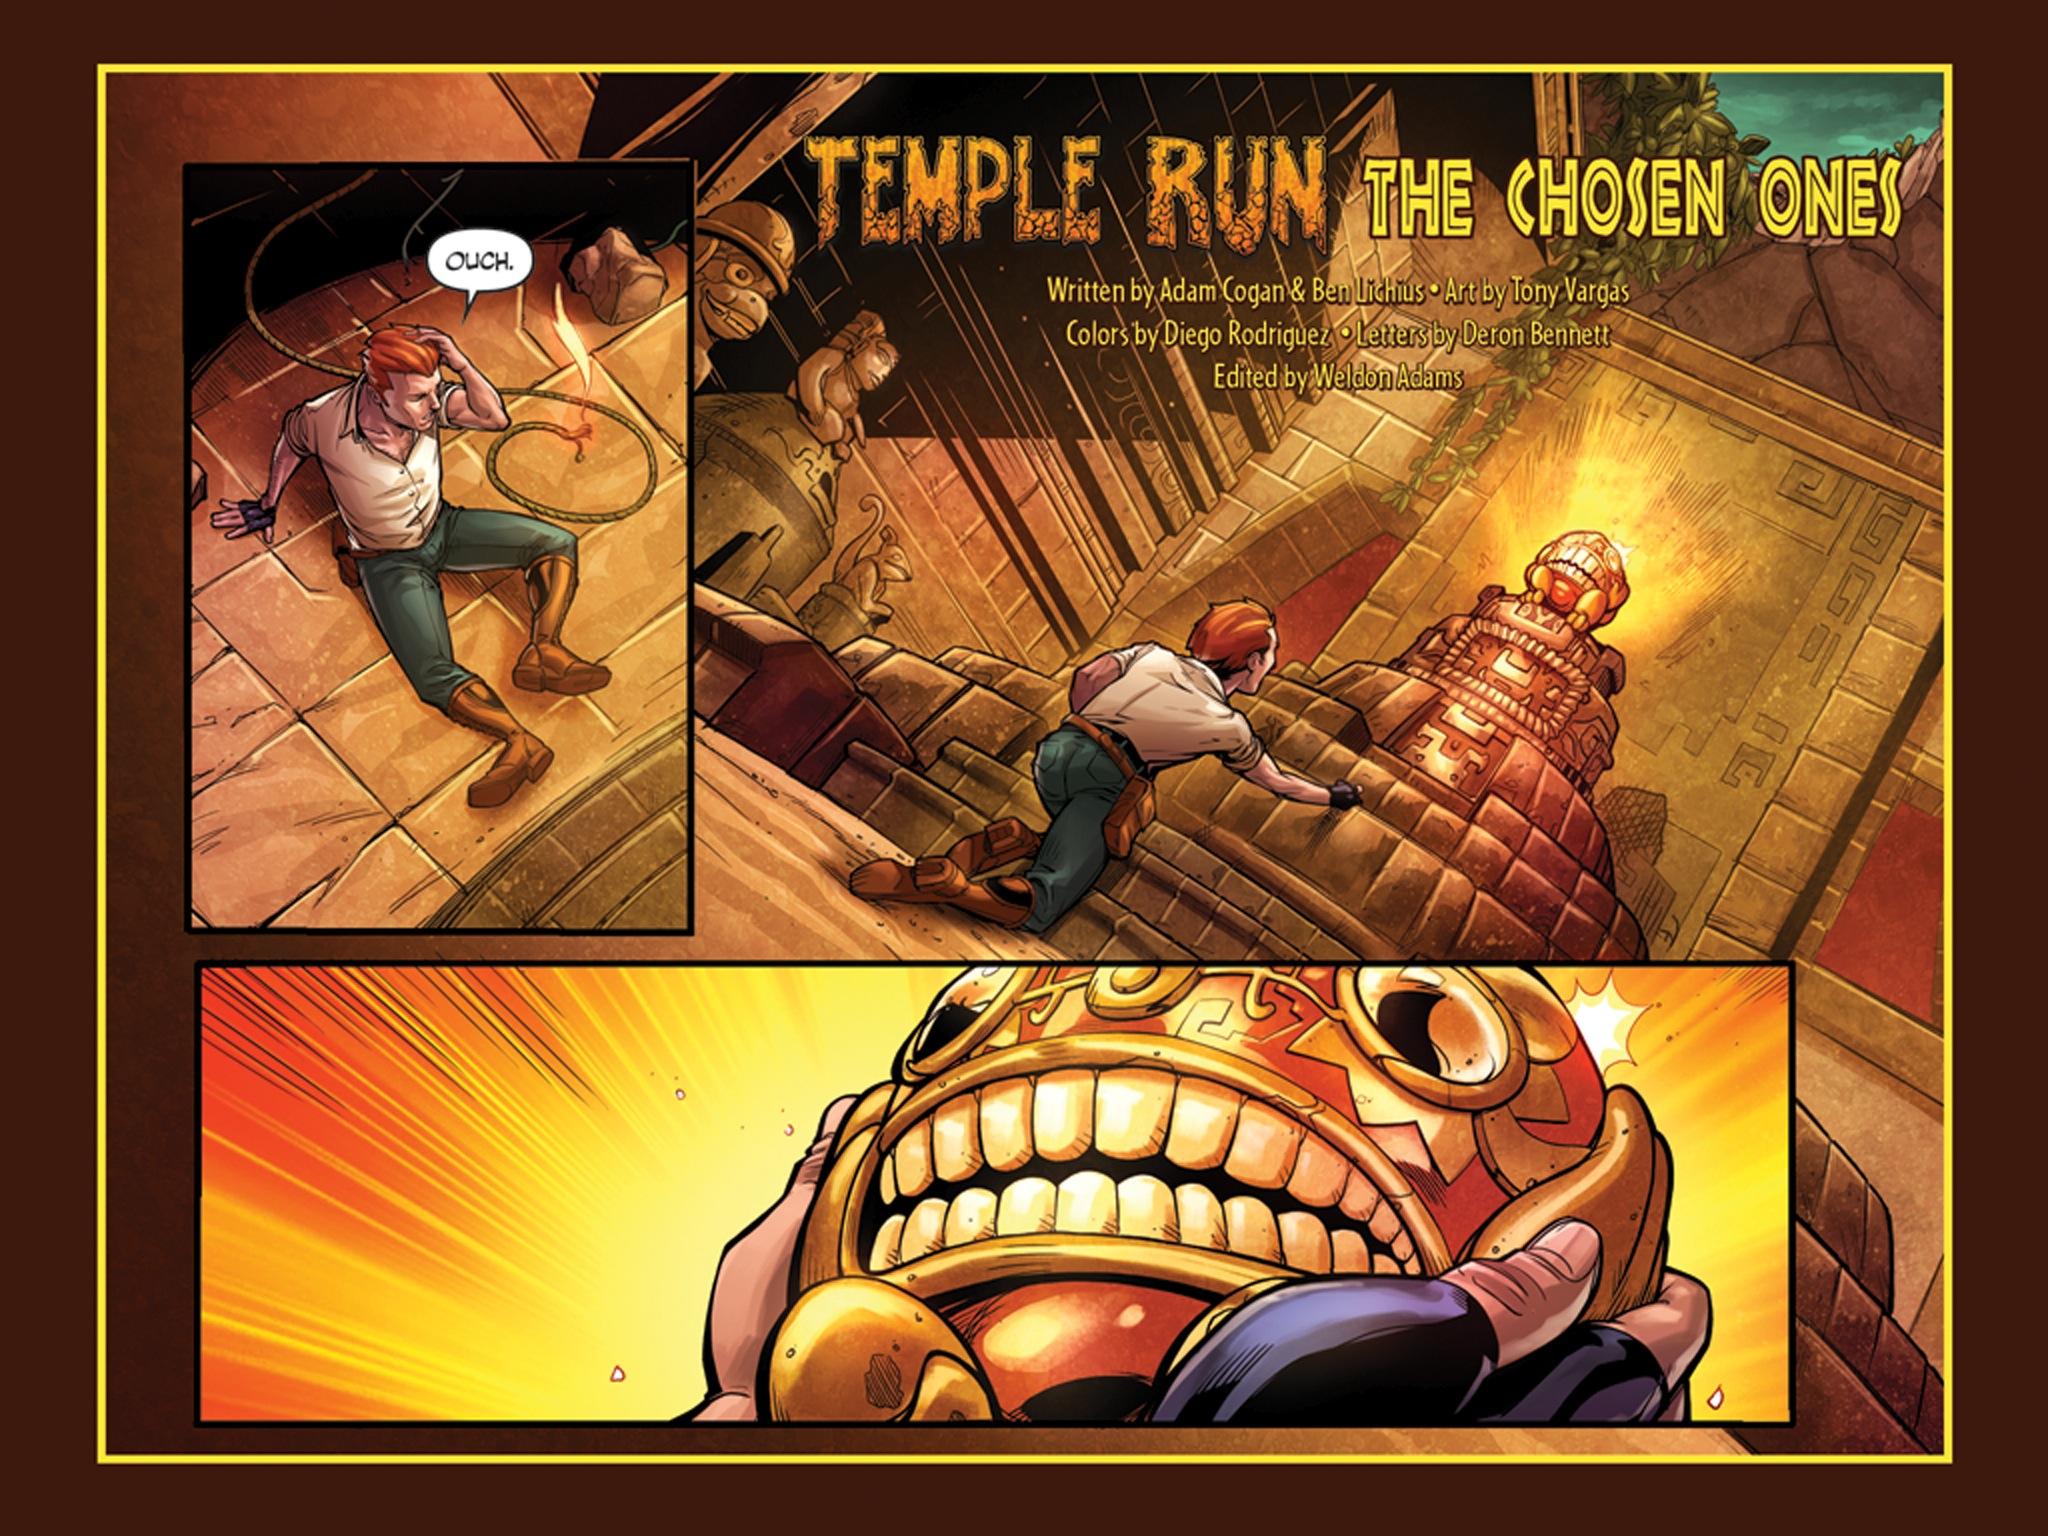 Temple Run Comics' Offers a Digital Look Into the Adventures